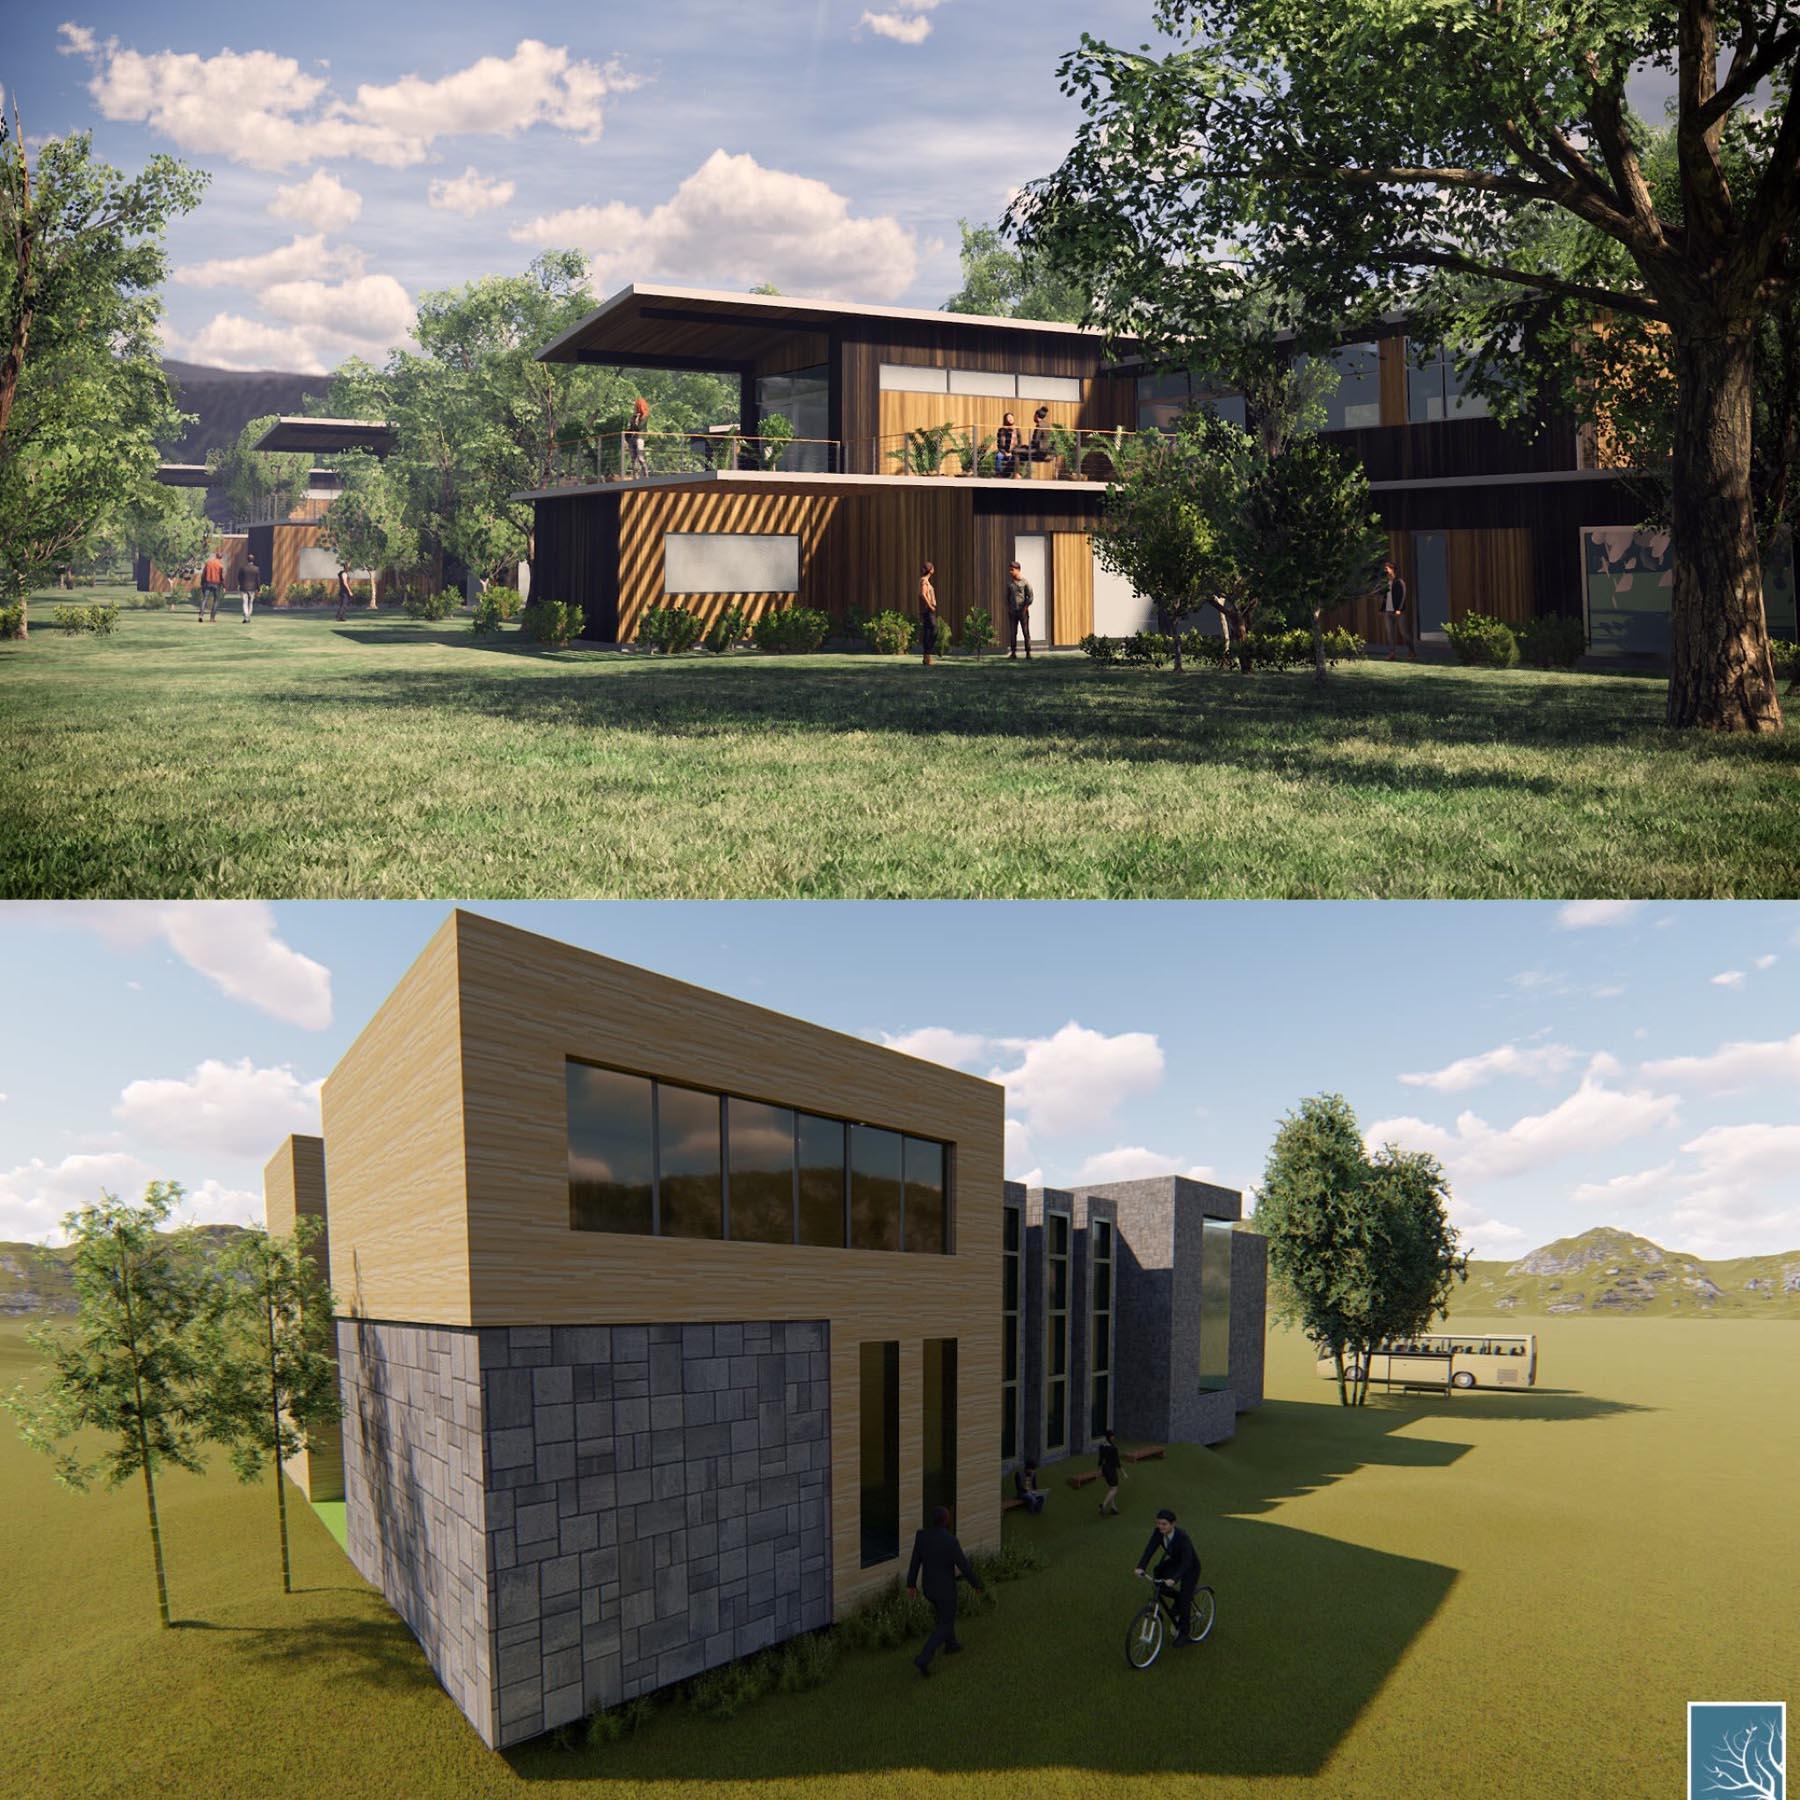 Ideas Scholarship 2019 Virginia Tech Solar Decathlon Design Competition Crowdfunding · school of